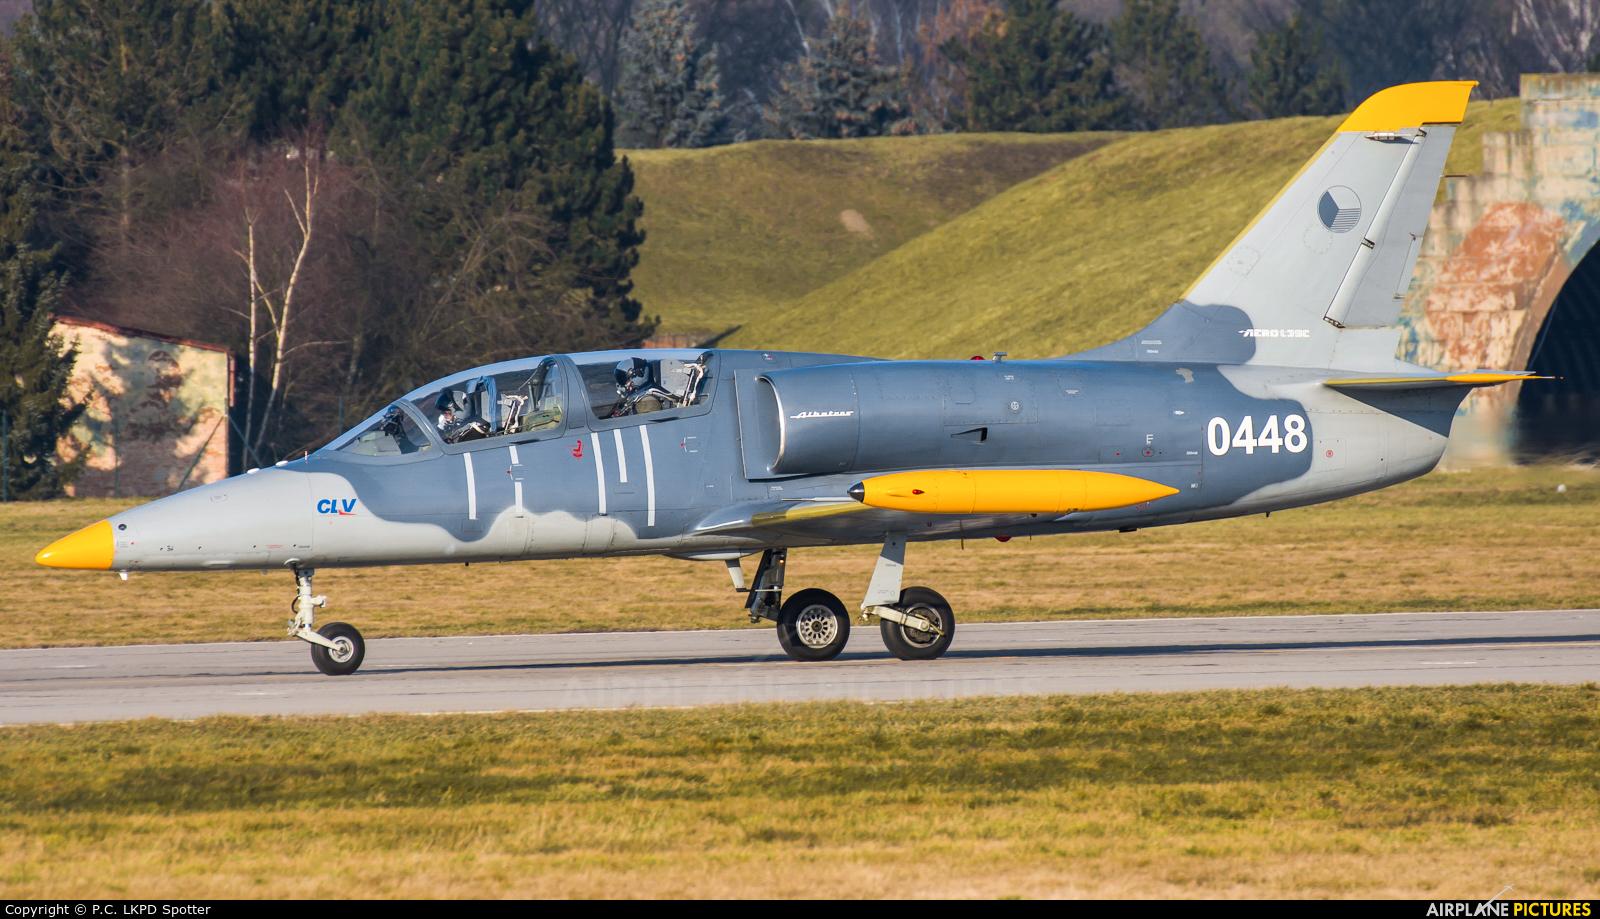 Czech - Air Force 0448 aircraft at Pardubice